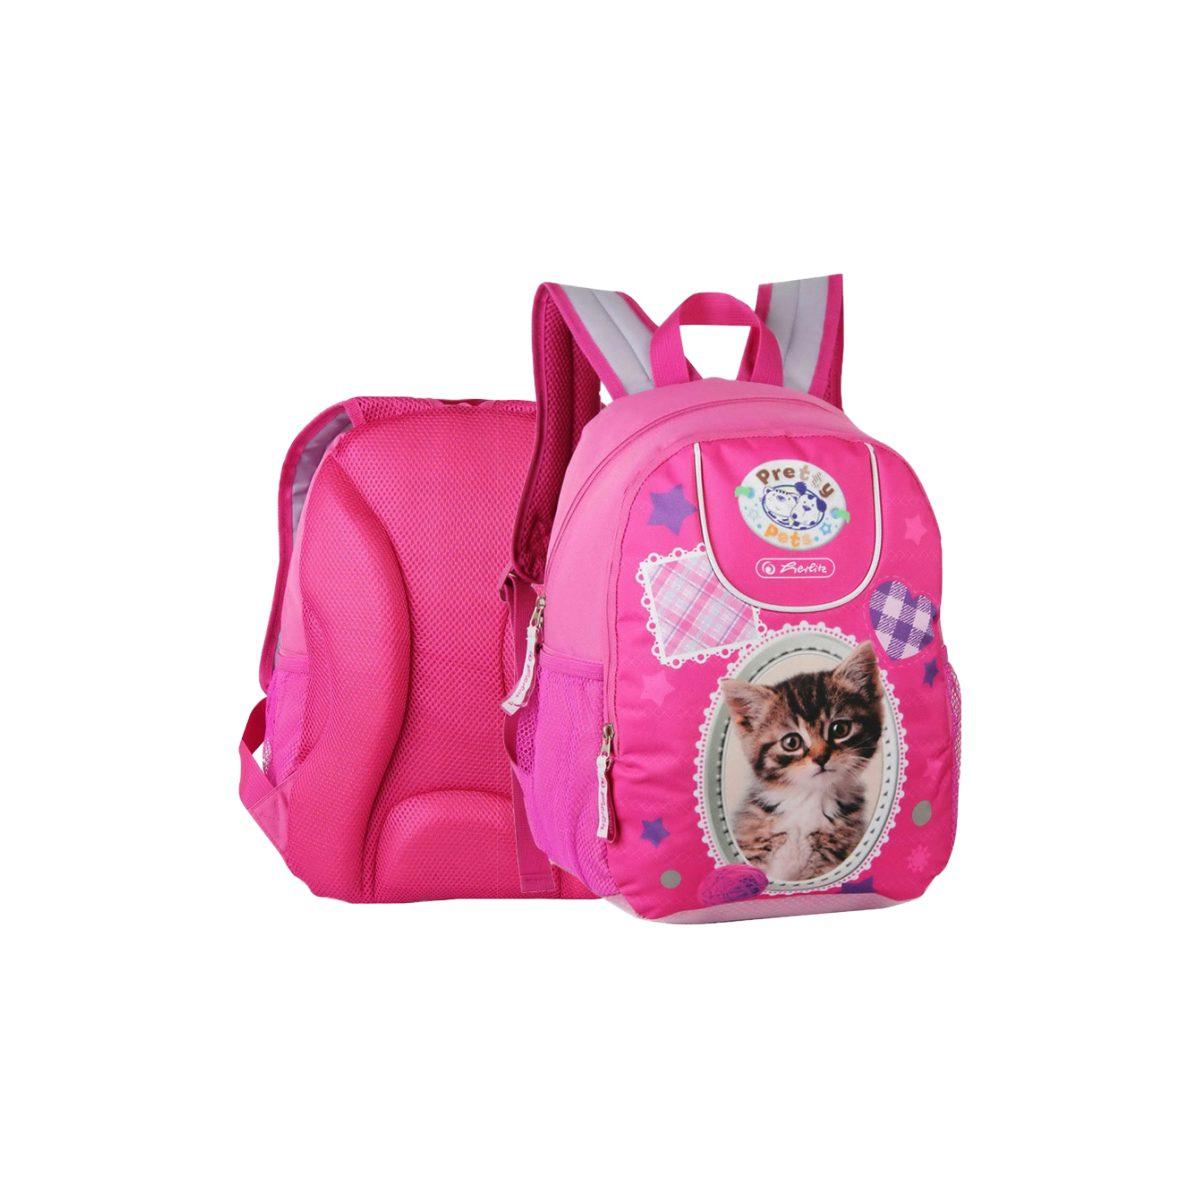 Rucsac cu un Compartiment, Pretty Pets Cat, Herlitz, 9465920-PISICA